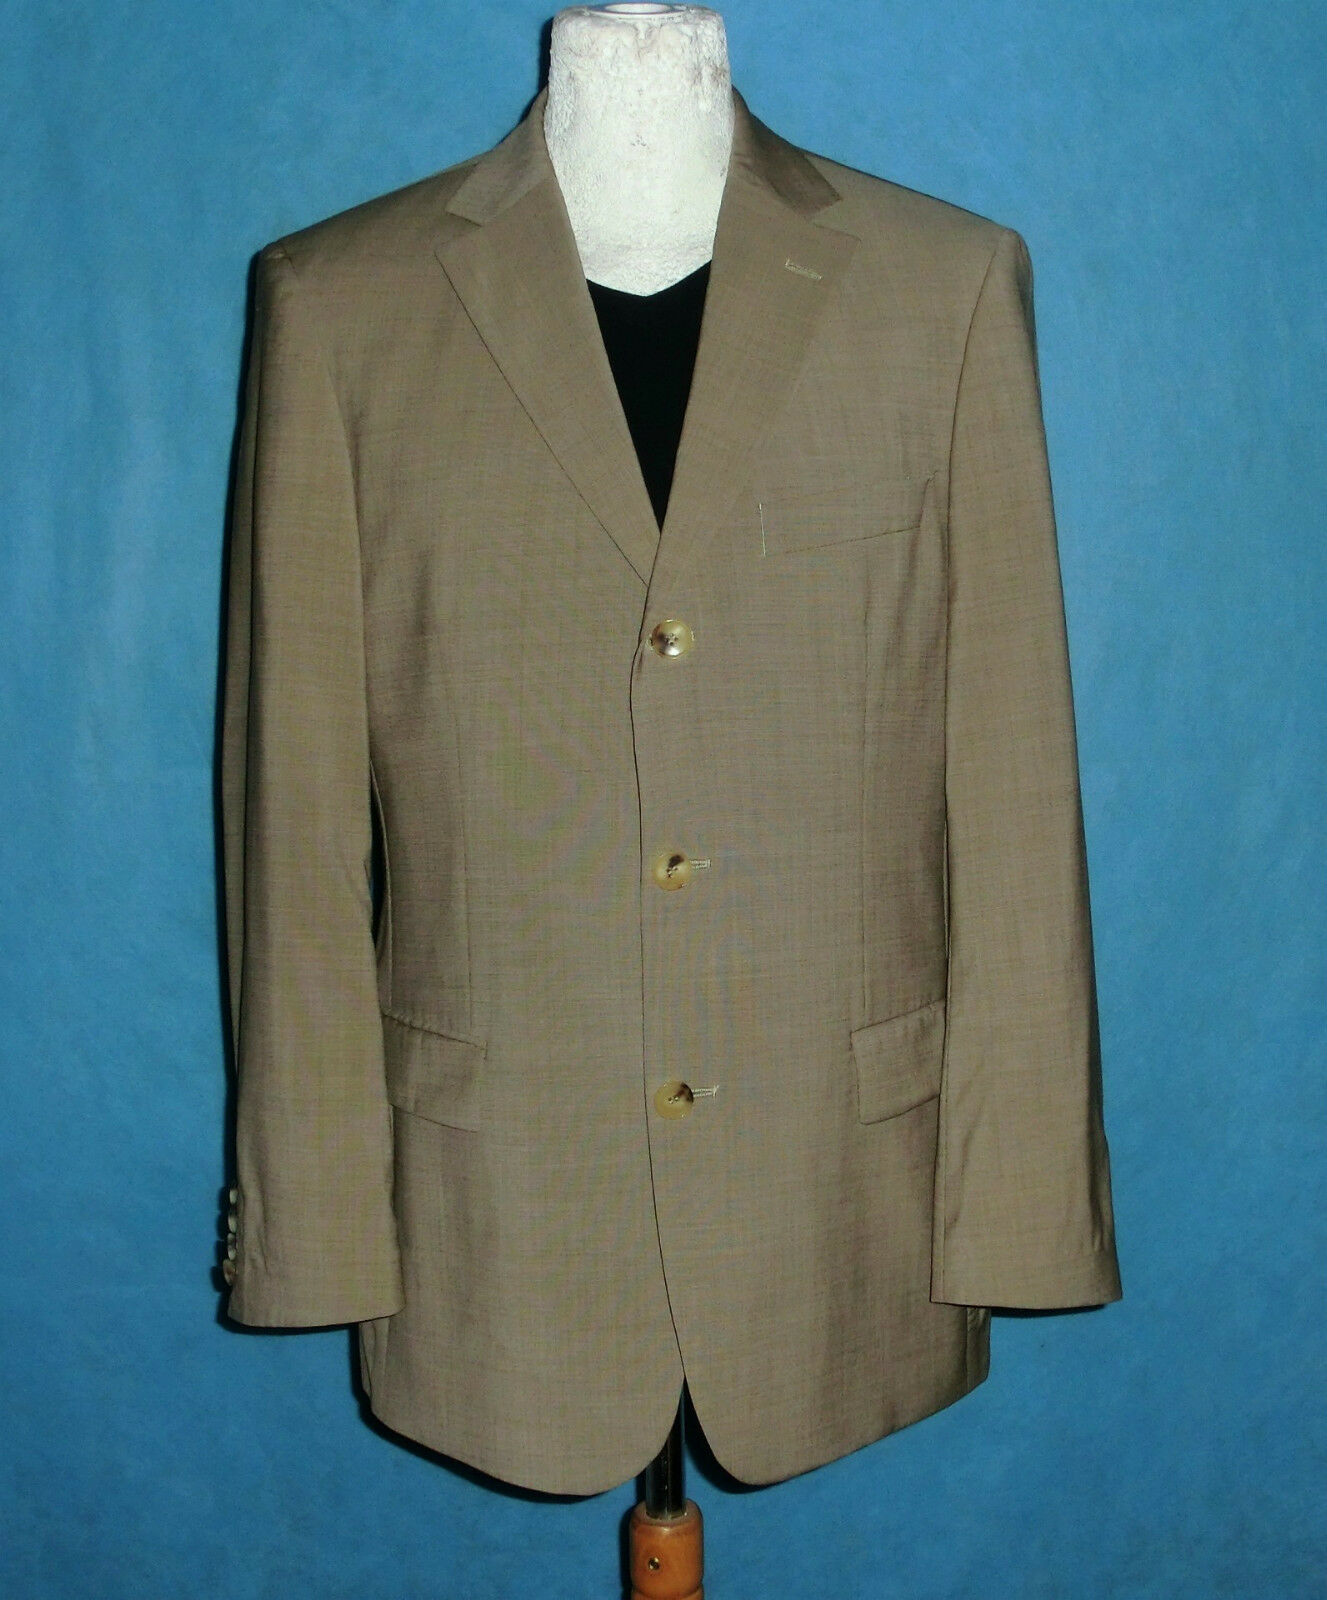 Veste de costume HUGO BOSS modele :rossellini/cinema taille 48 tres bon etat